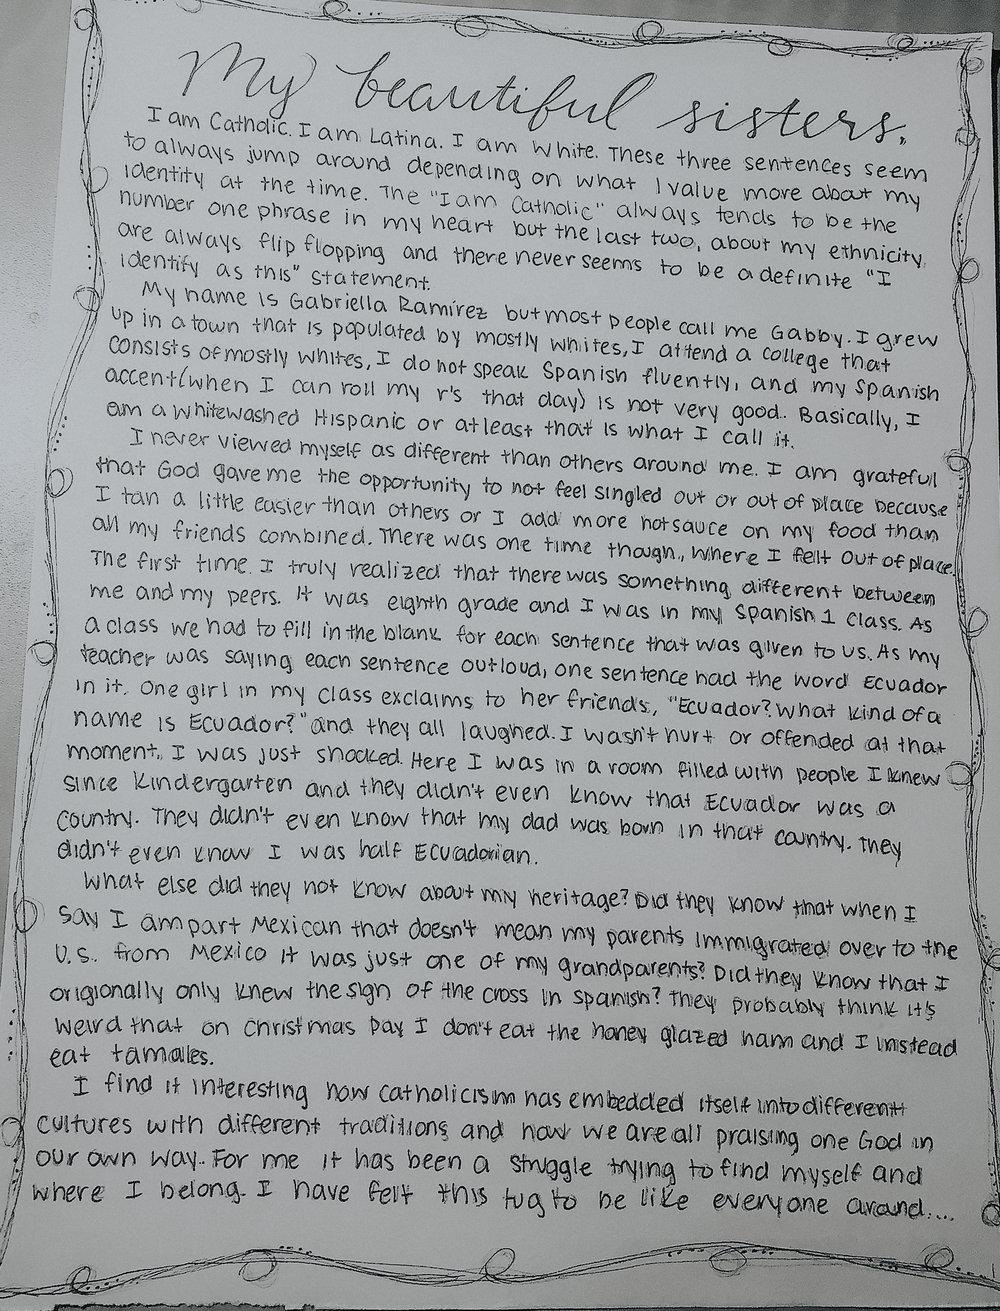 The Catholic Woman Letter.jpg